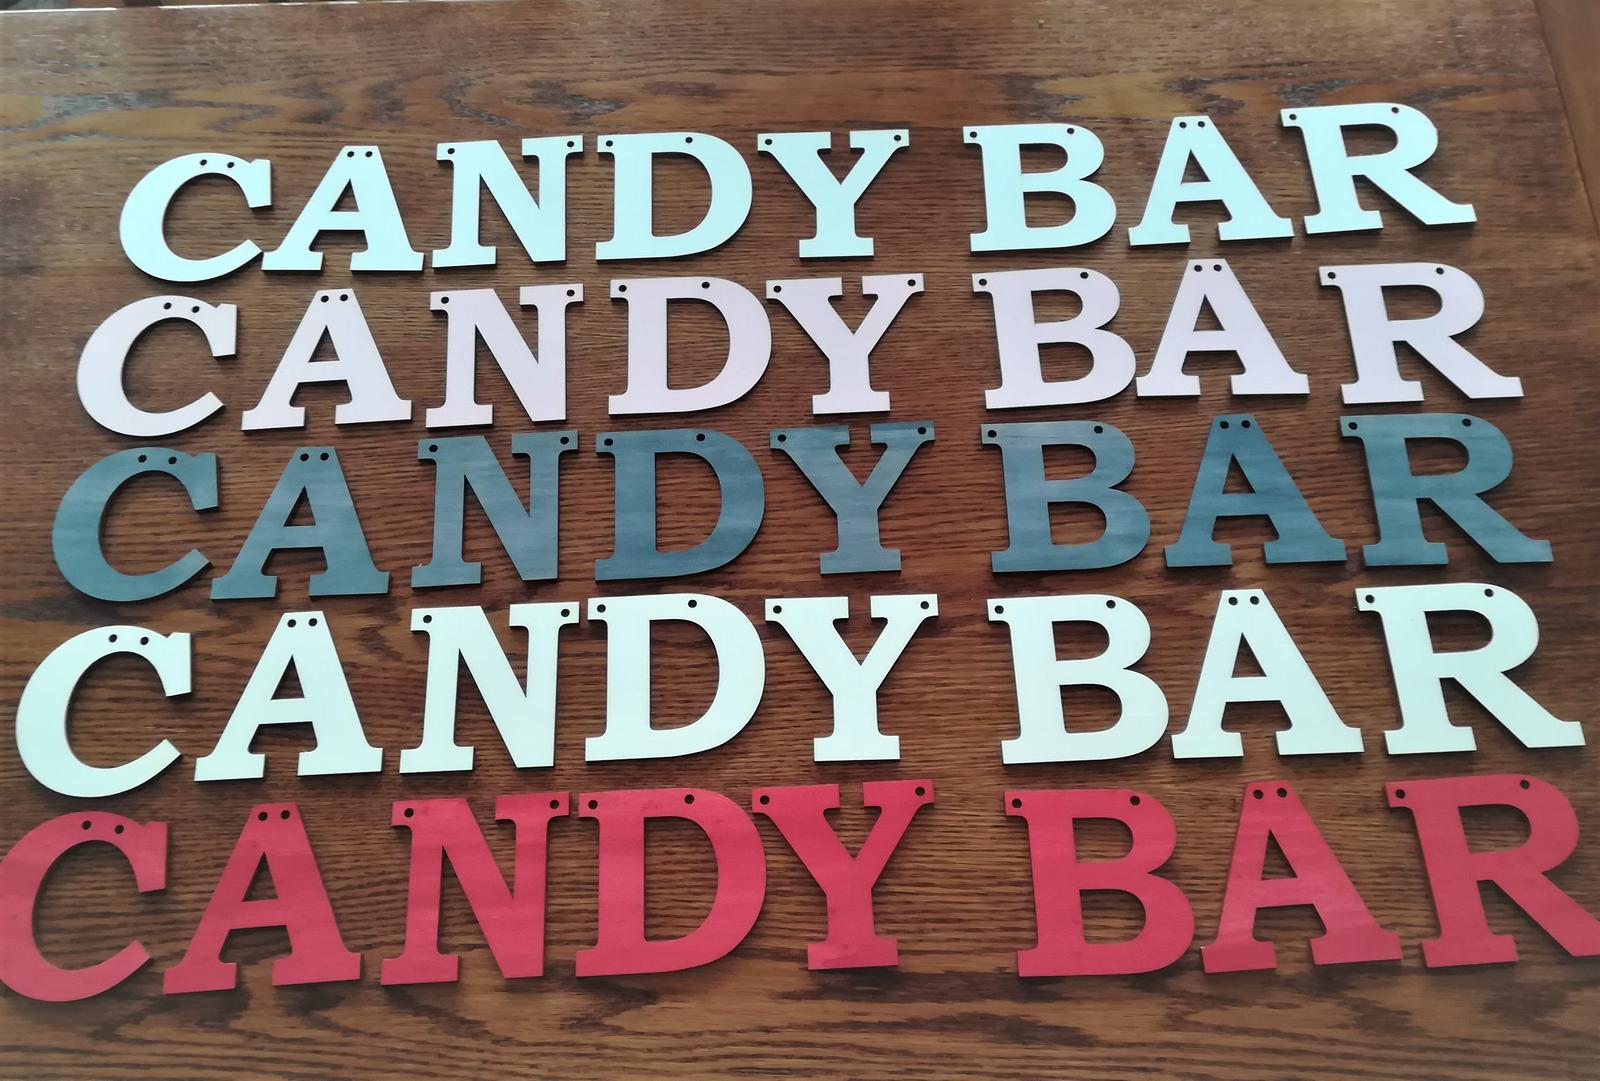 Nápis Candy bar - Obrázok č. 1